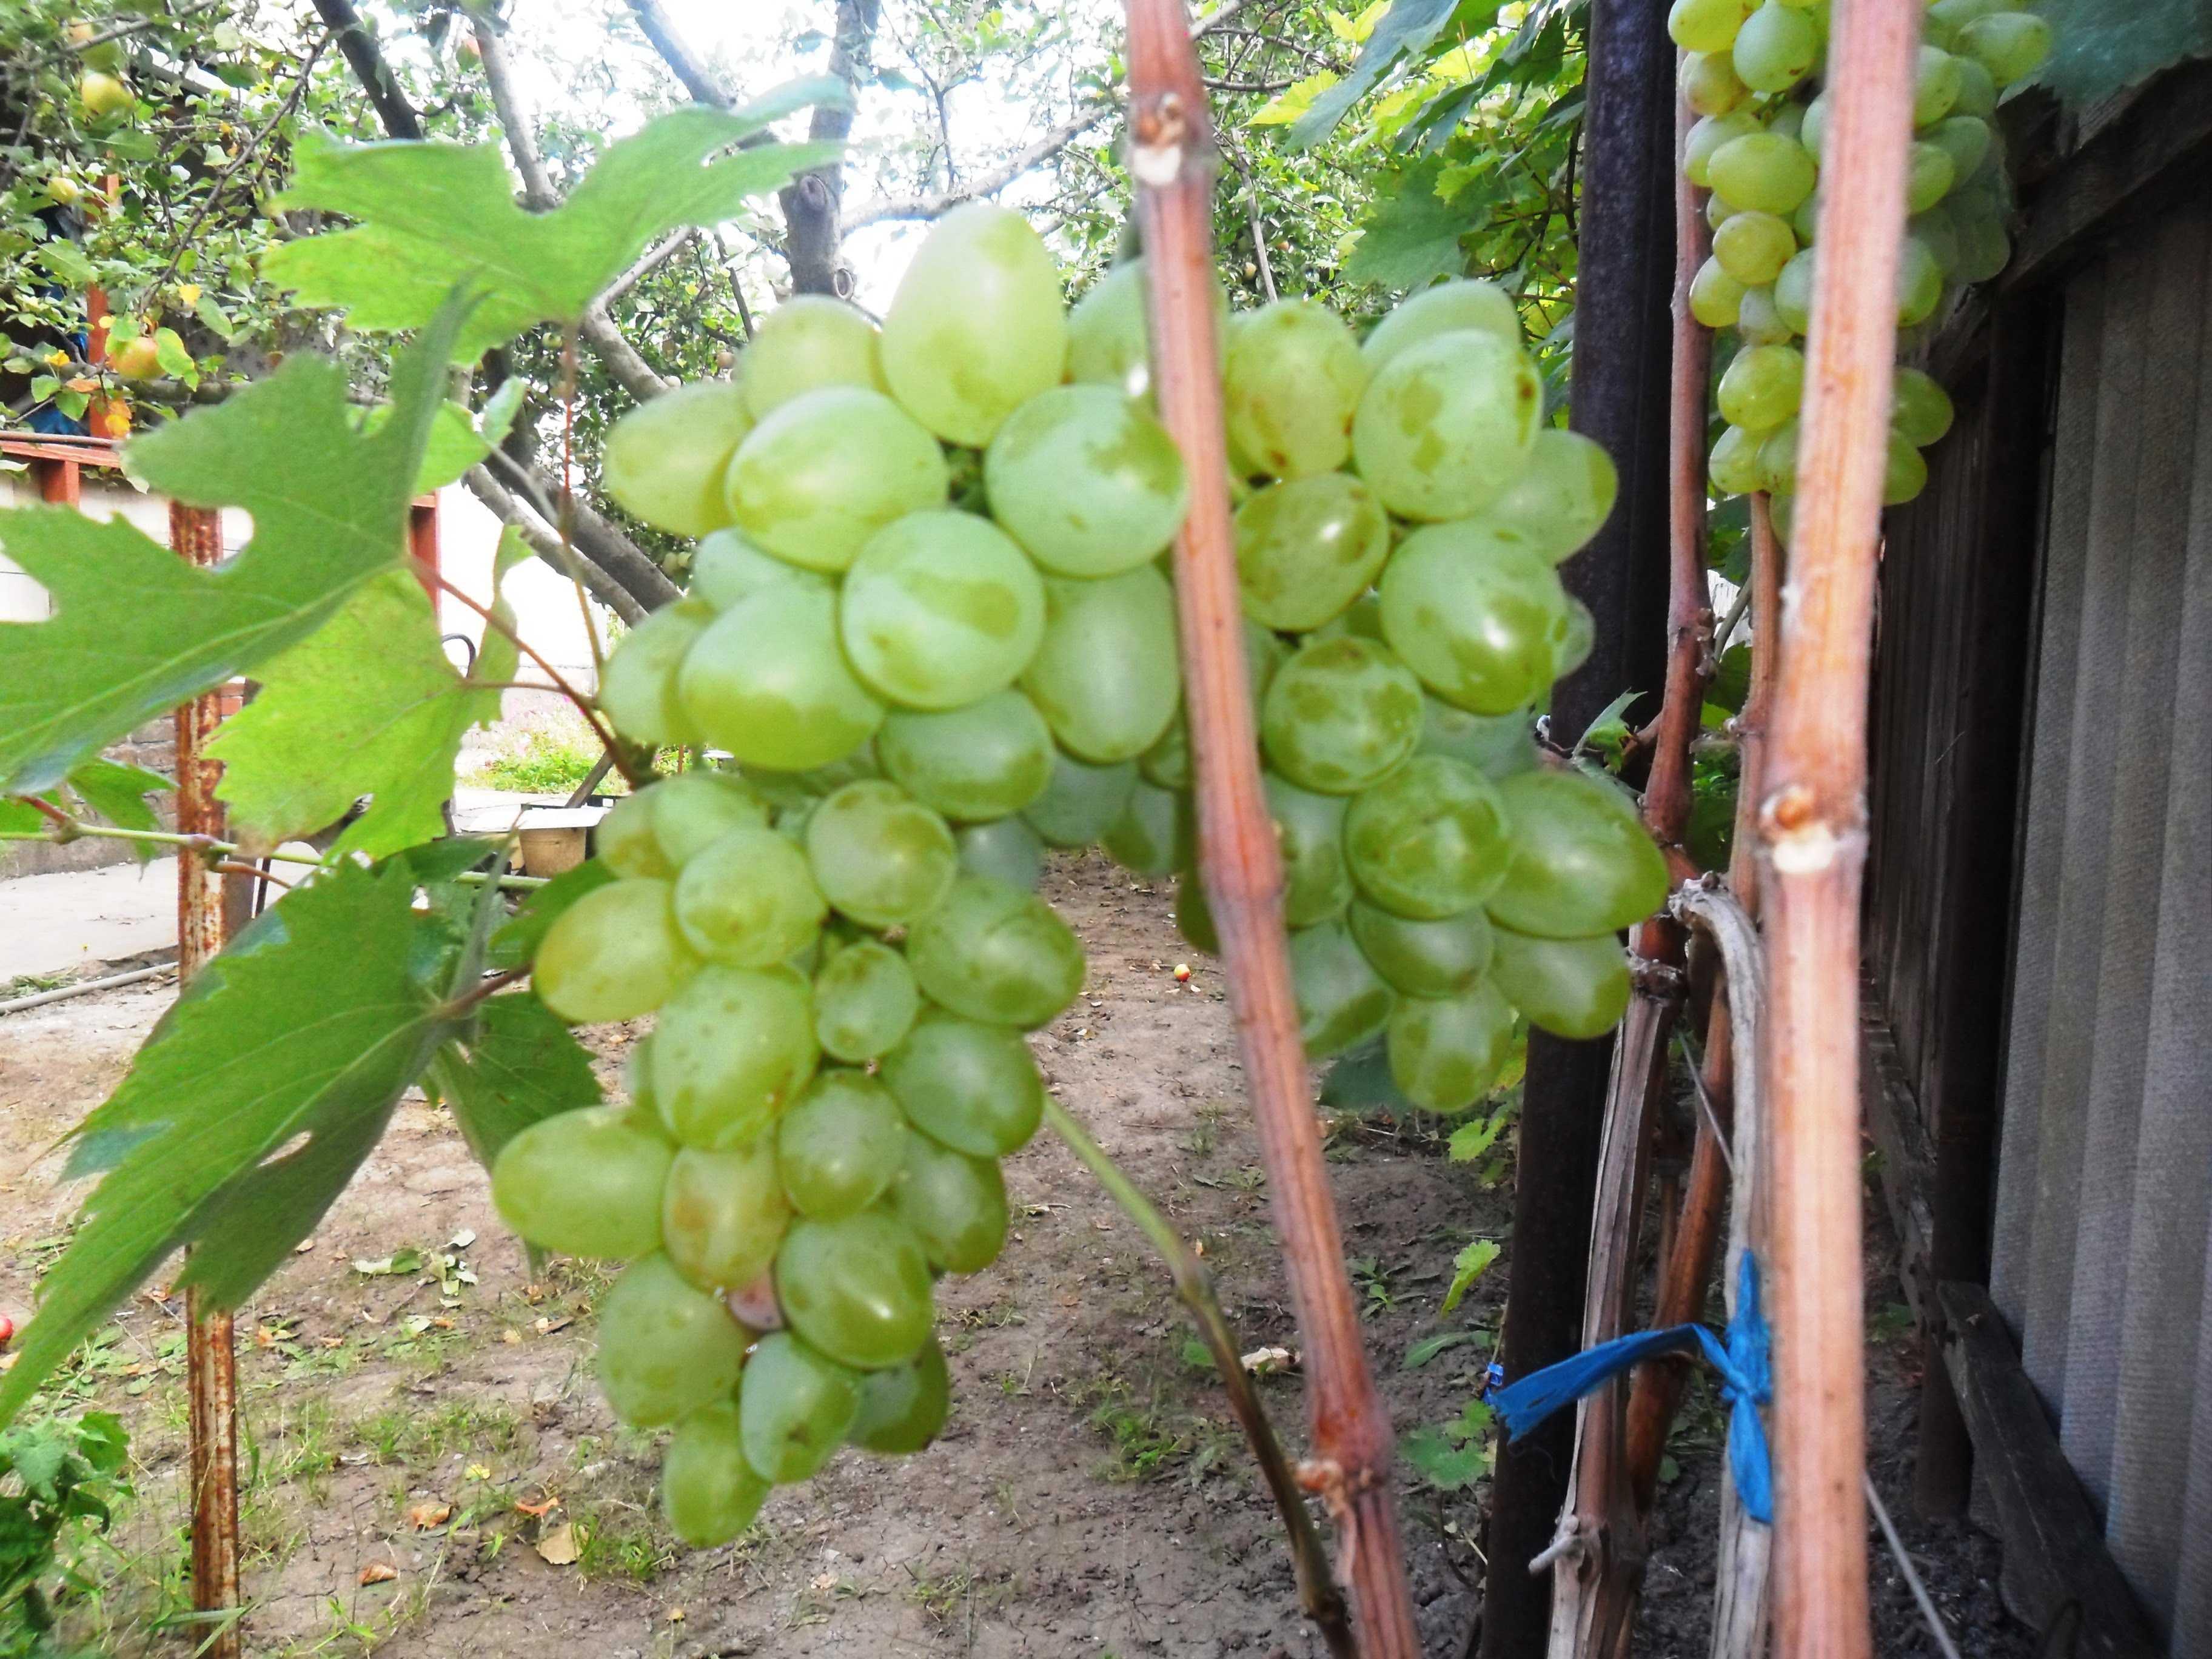 всему старому виноград кеша фото описание и характеристика товары имеют